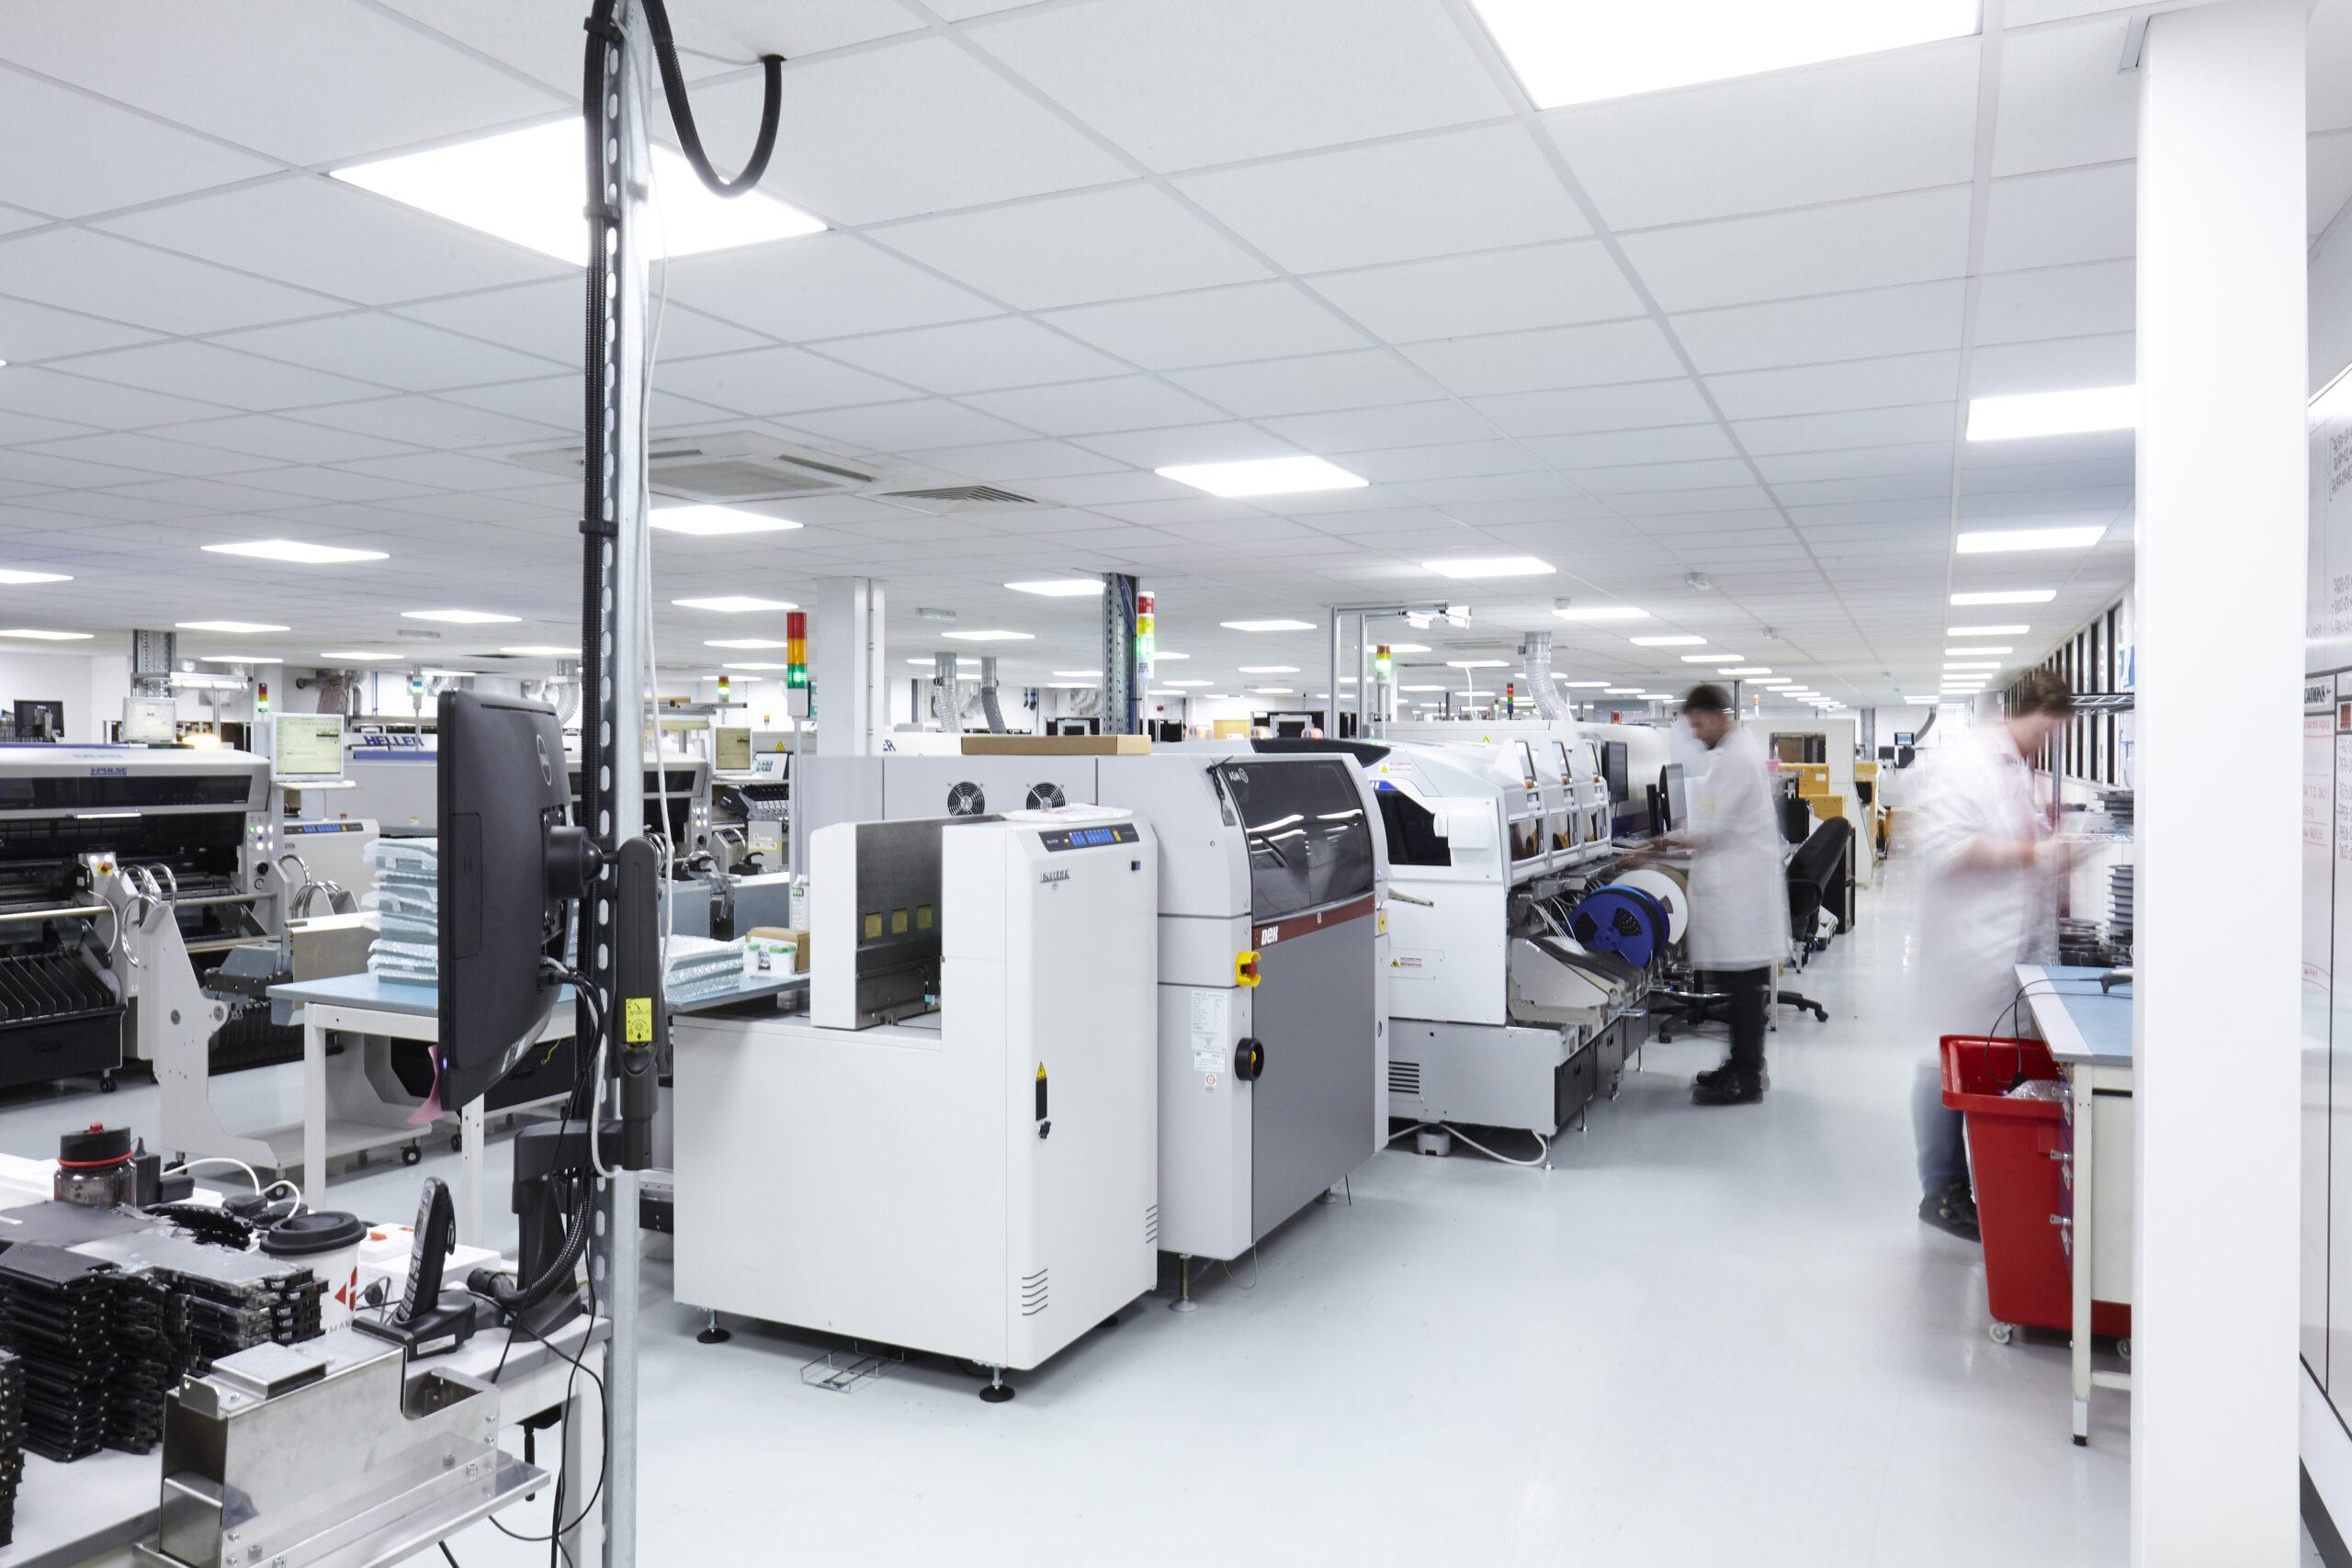 Machinery in Hanover warehouse